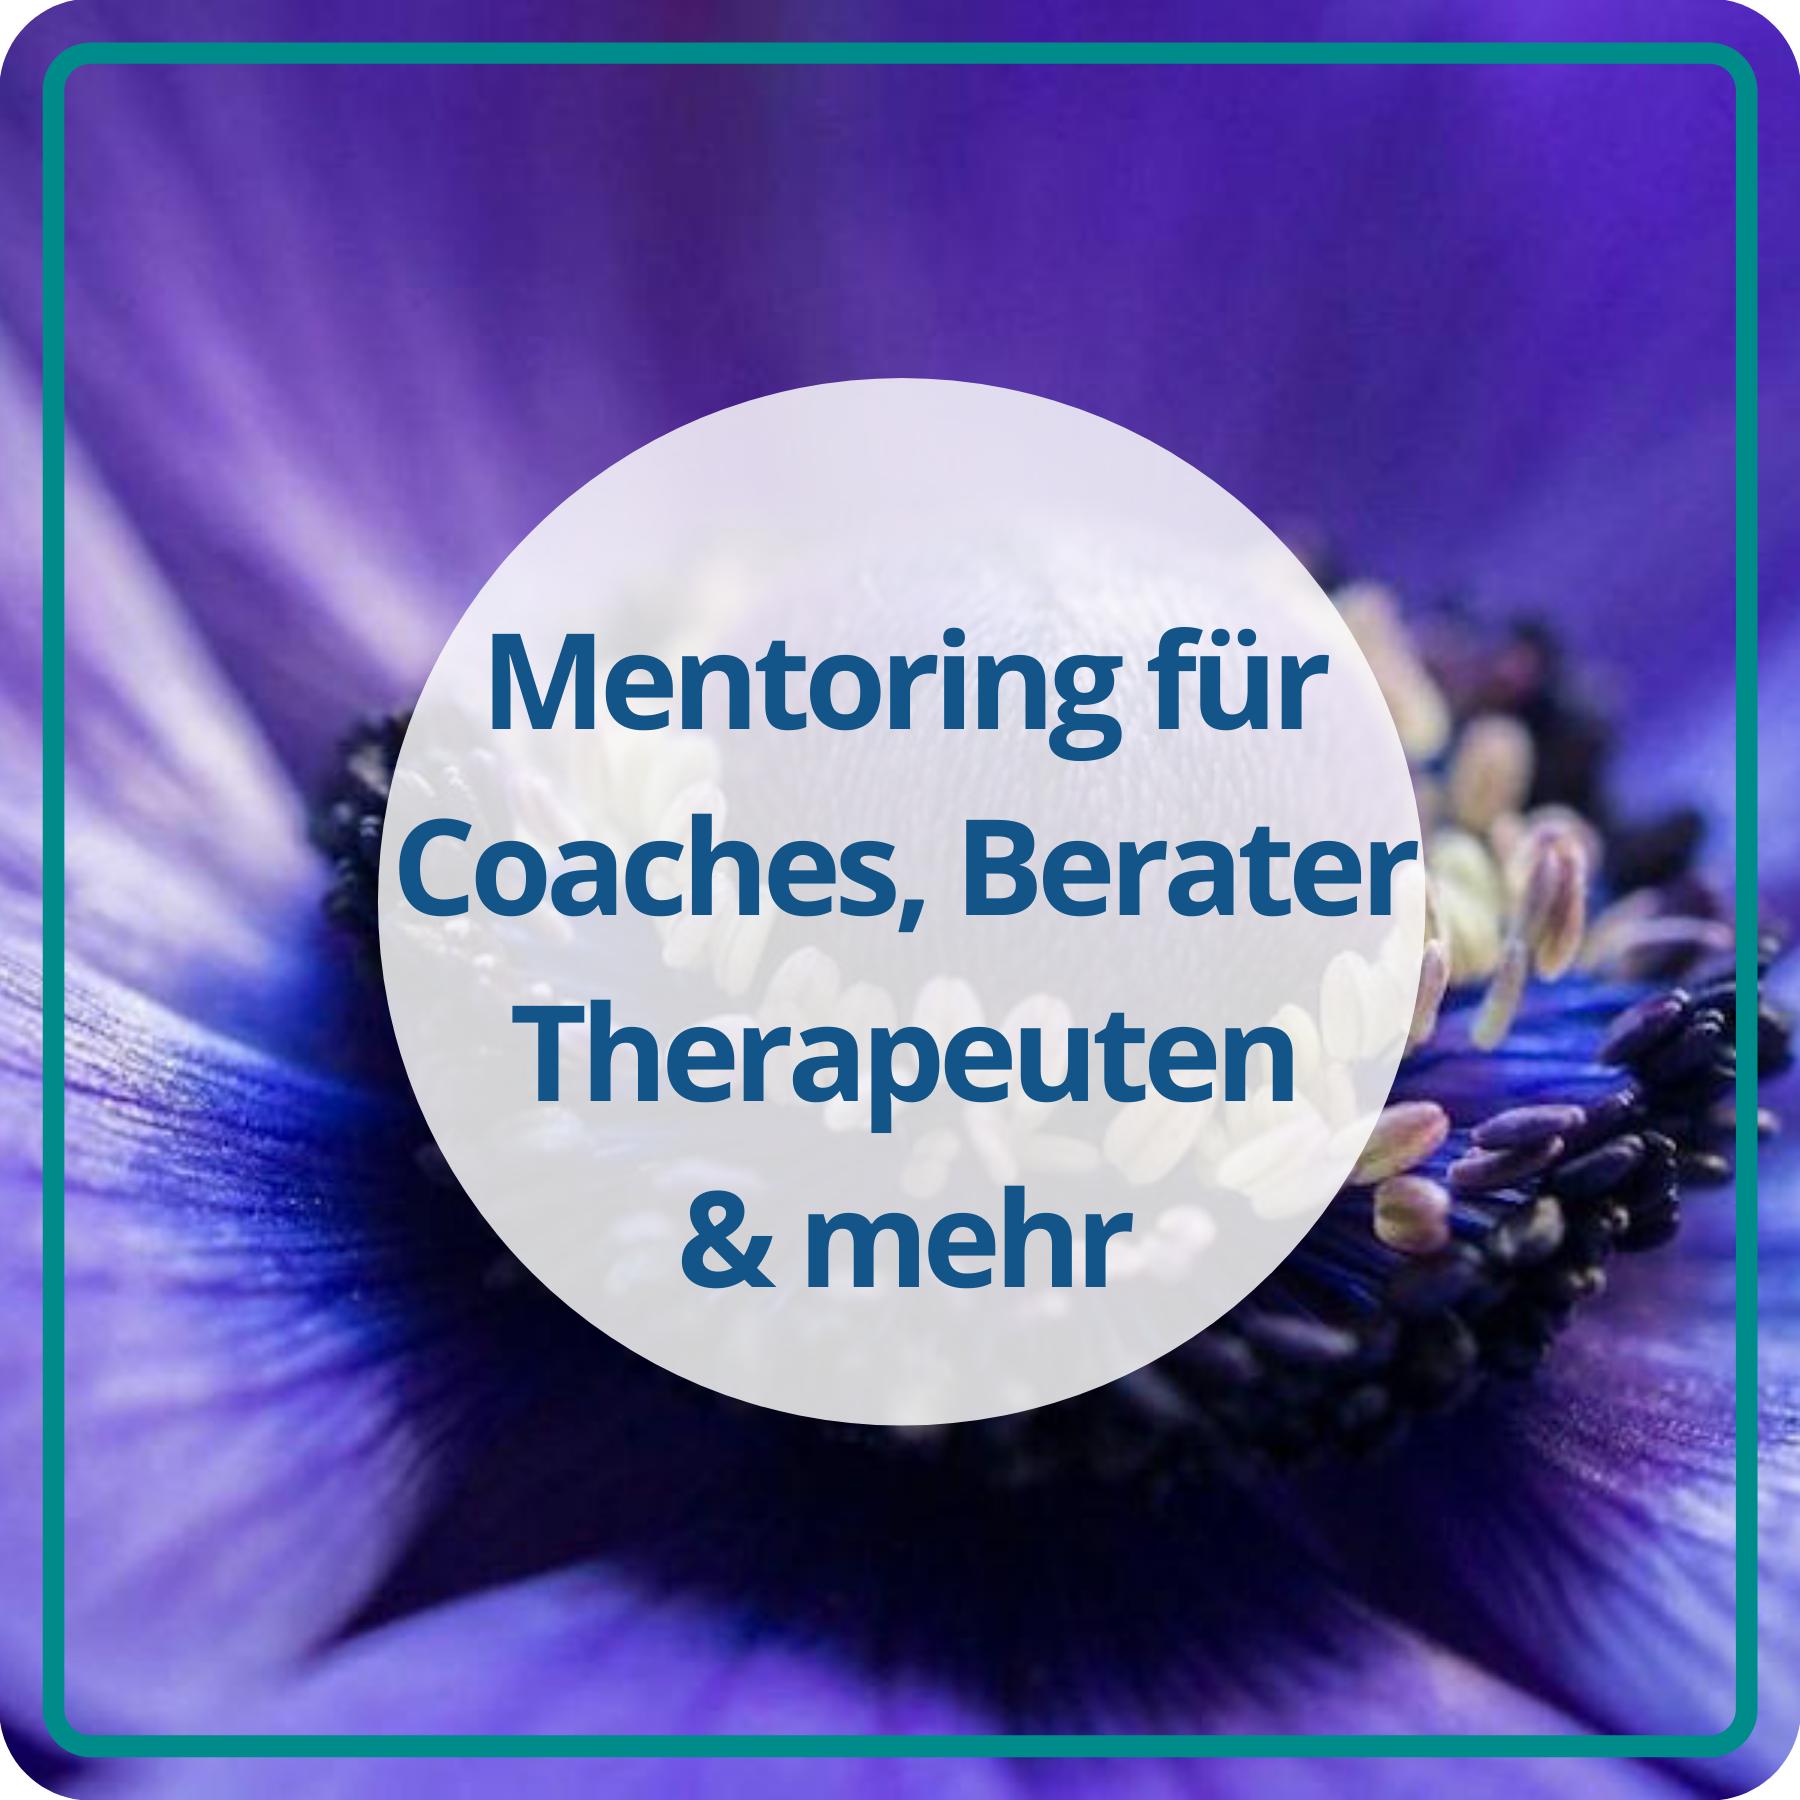 Mentoring für Coaches, Therapeuten, Heiler, Berater